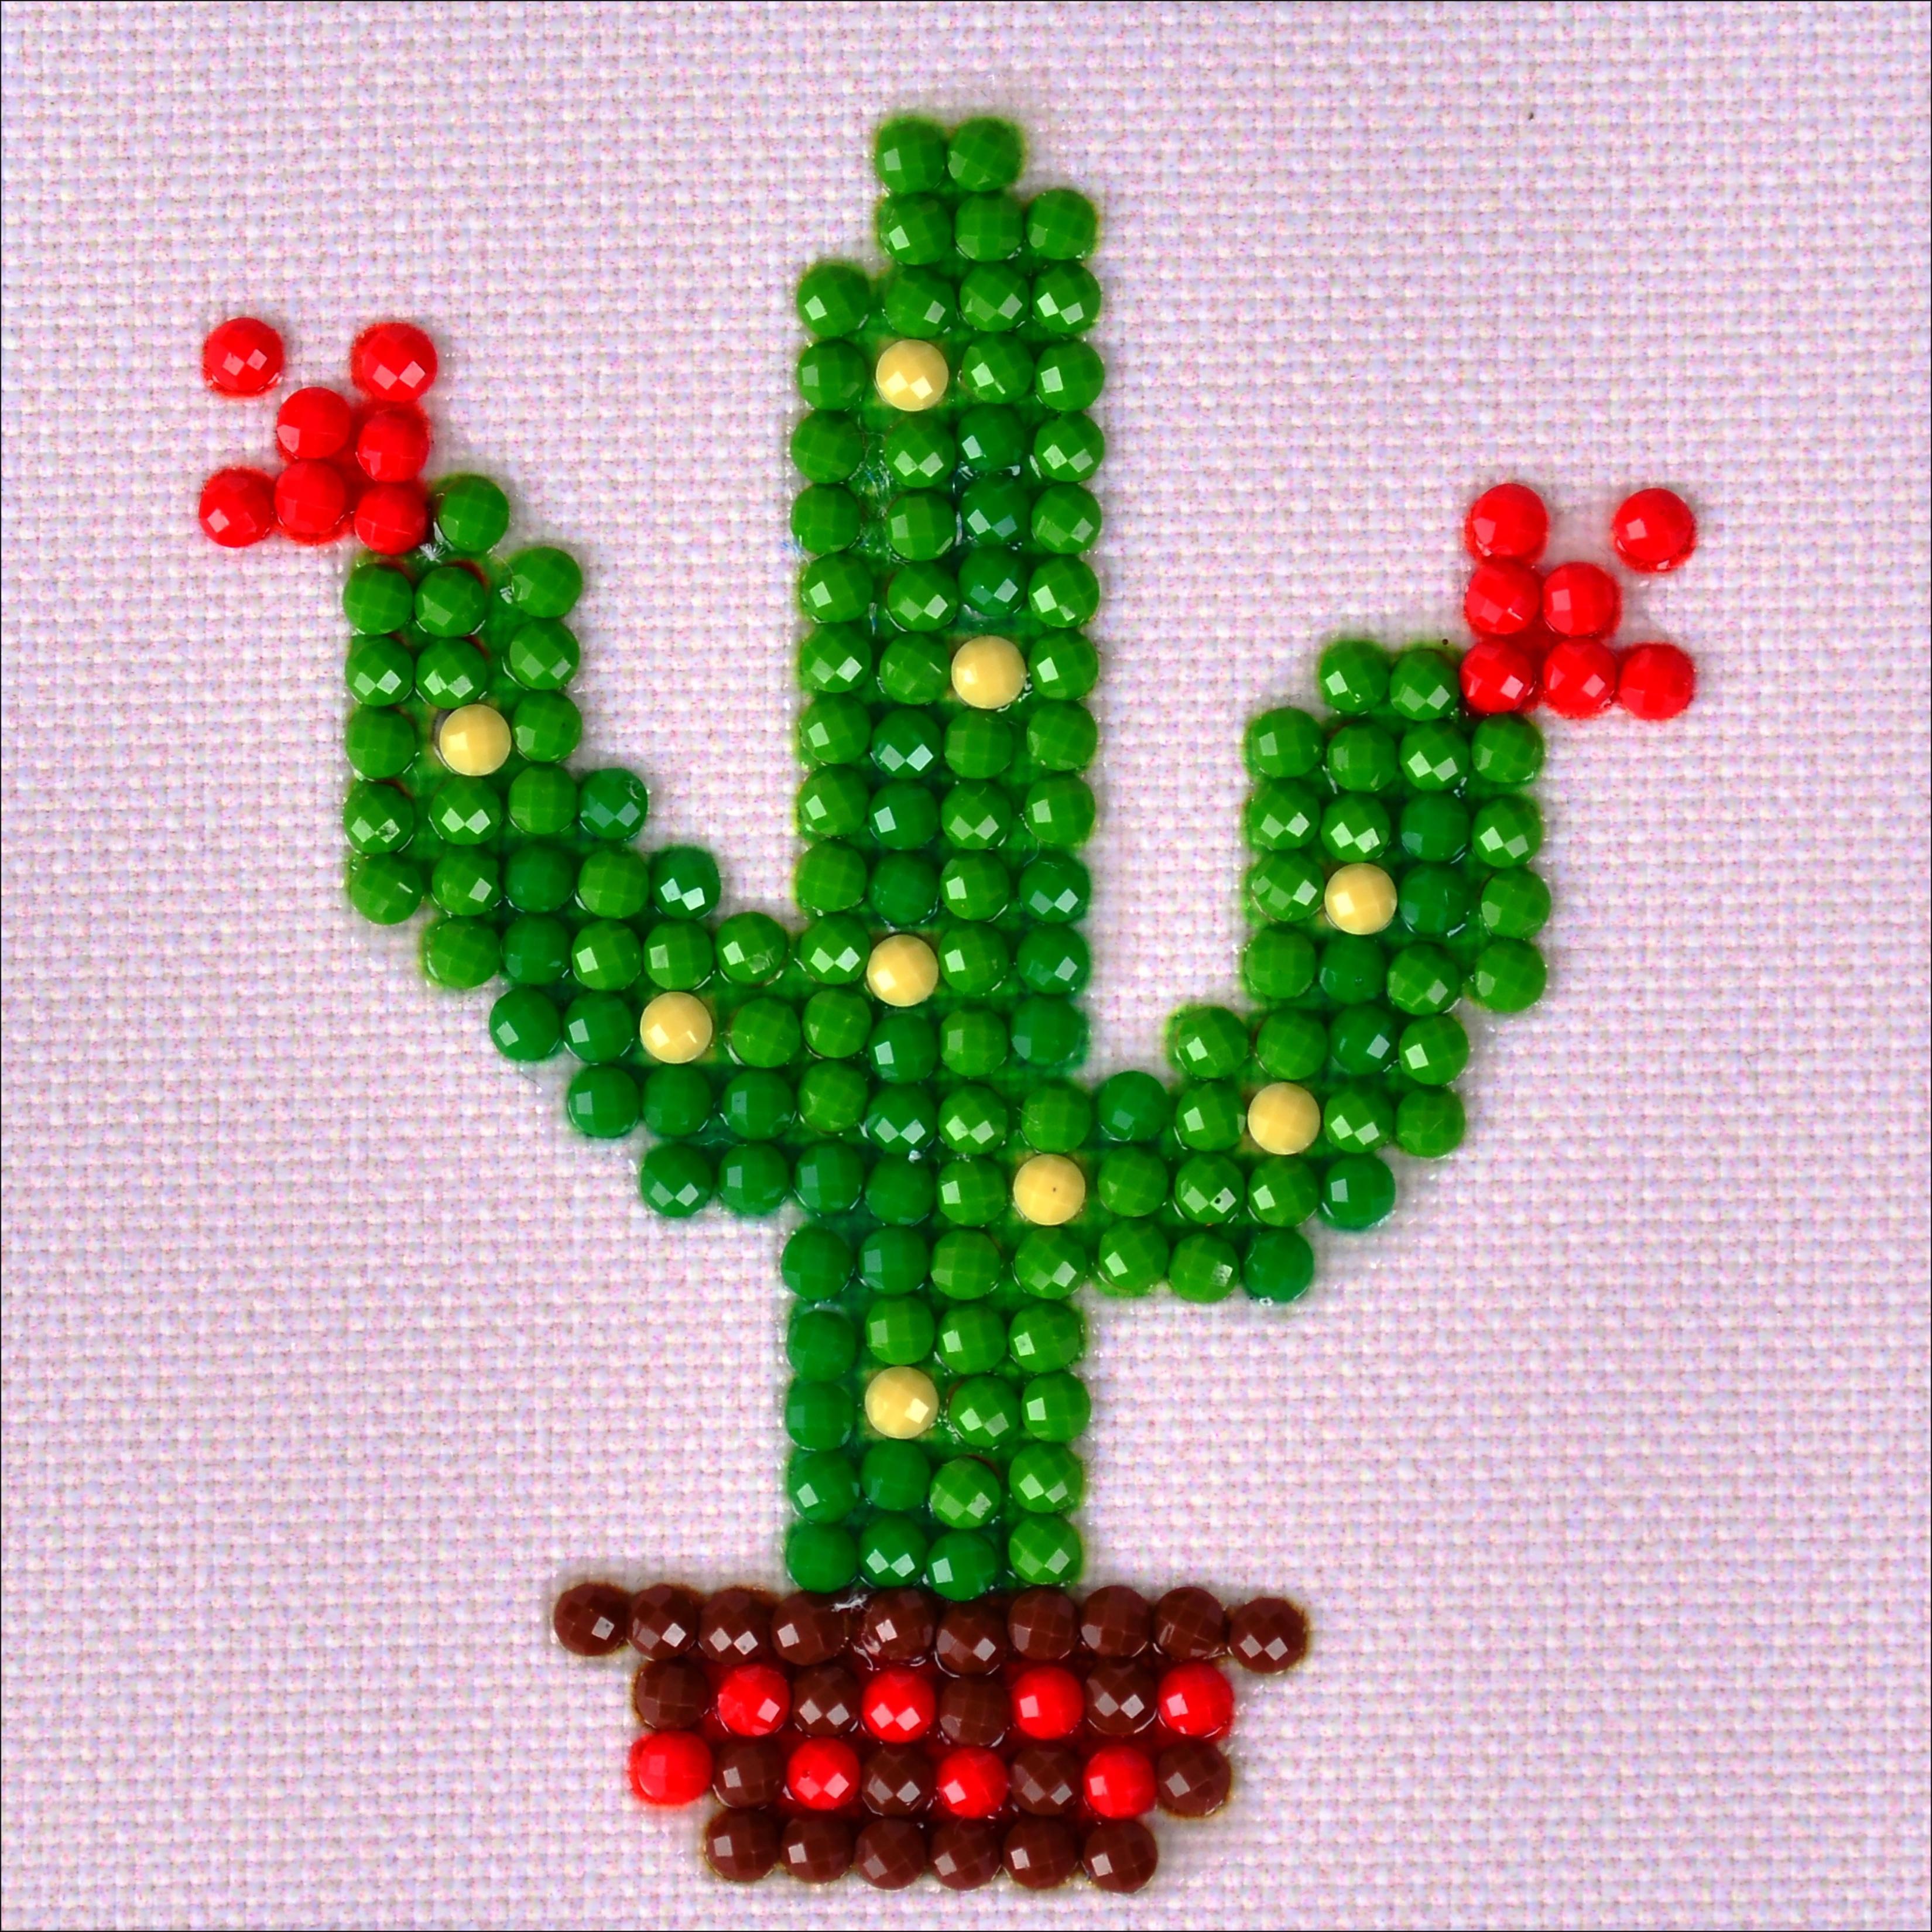 Diamond Dotz Diamond Embroidery Facet Art Kit 4.75X4.75-Texas Bloom